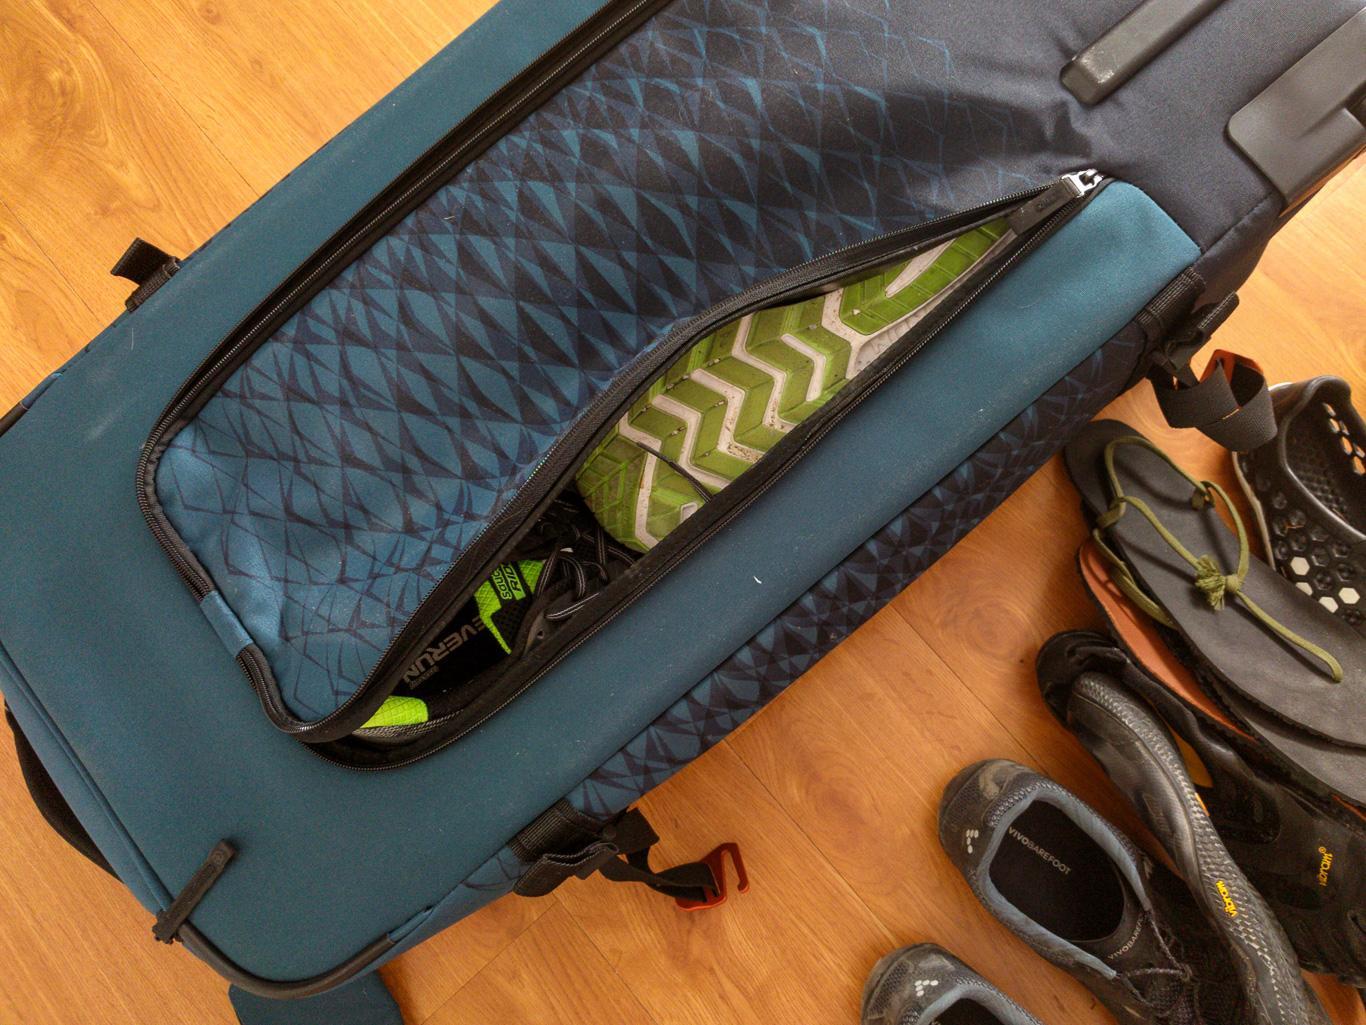 Rückentasche für ca. 2 Paar Laufschuhe